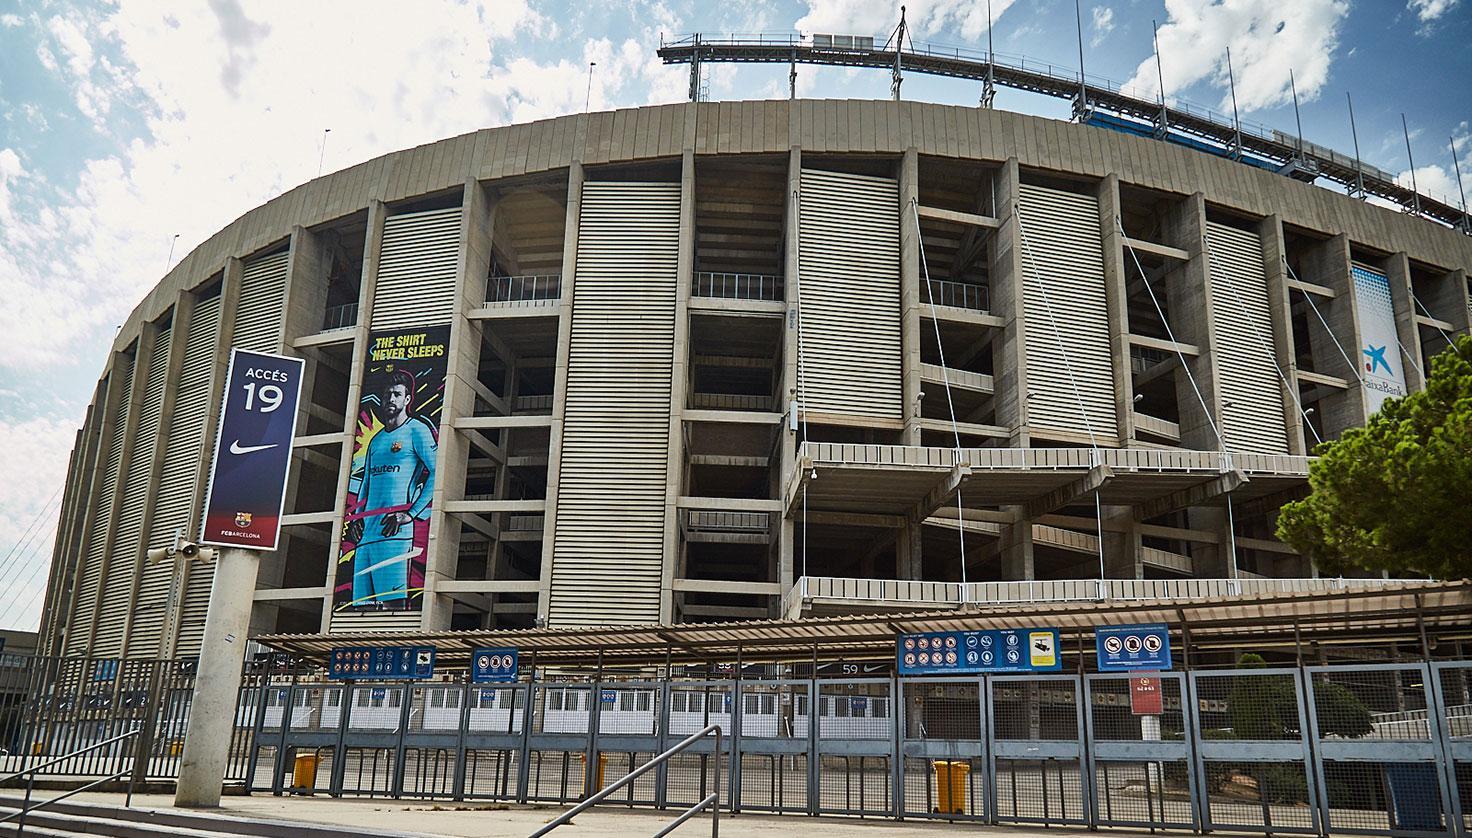 Camp Nou - Futbol Club Barcelona fotografie